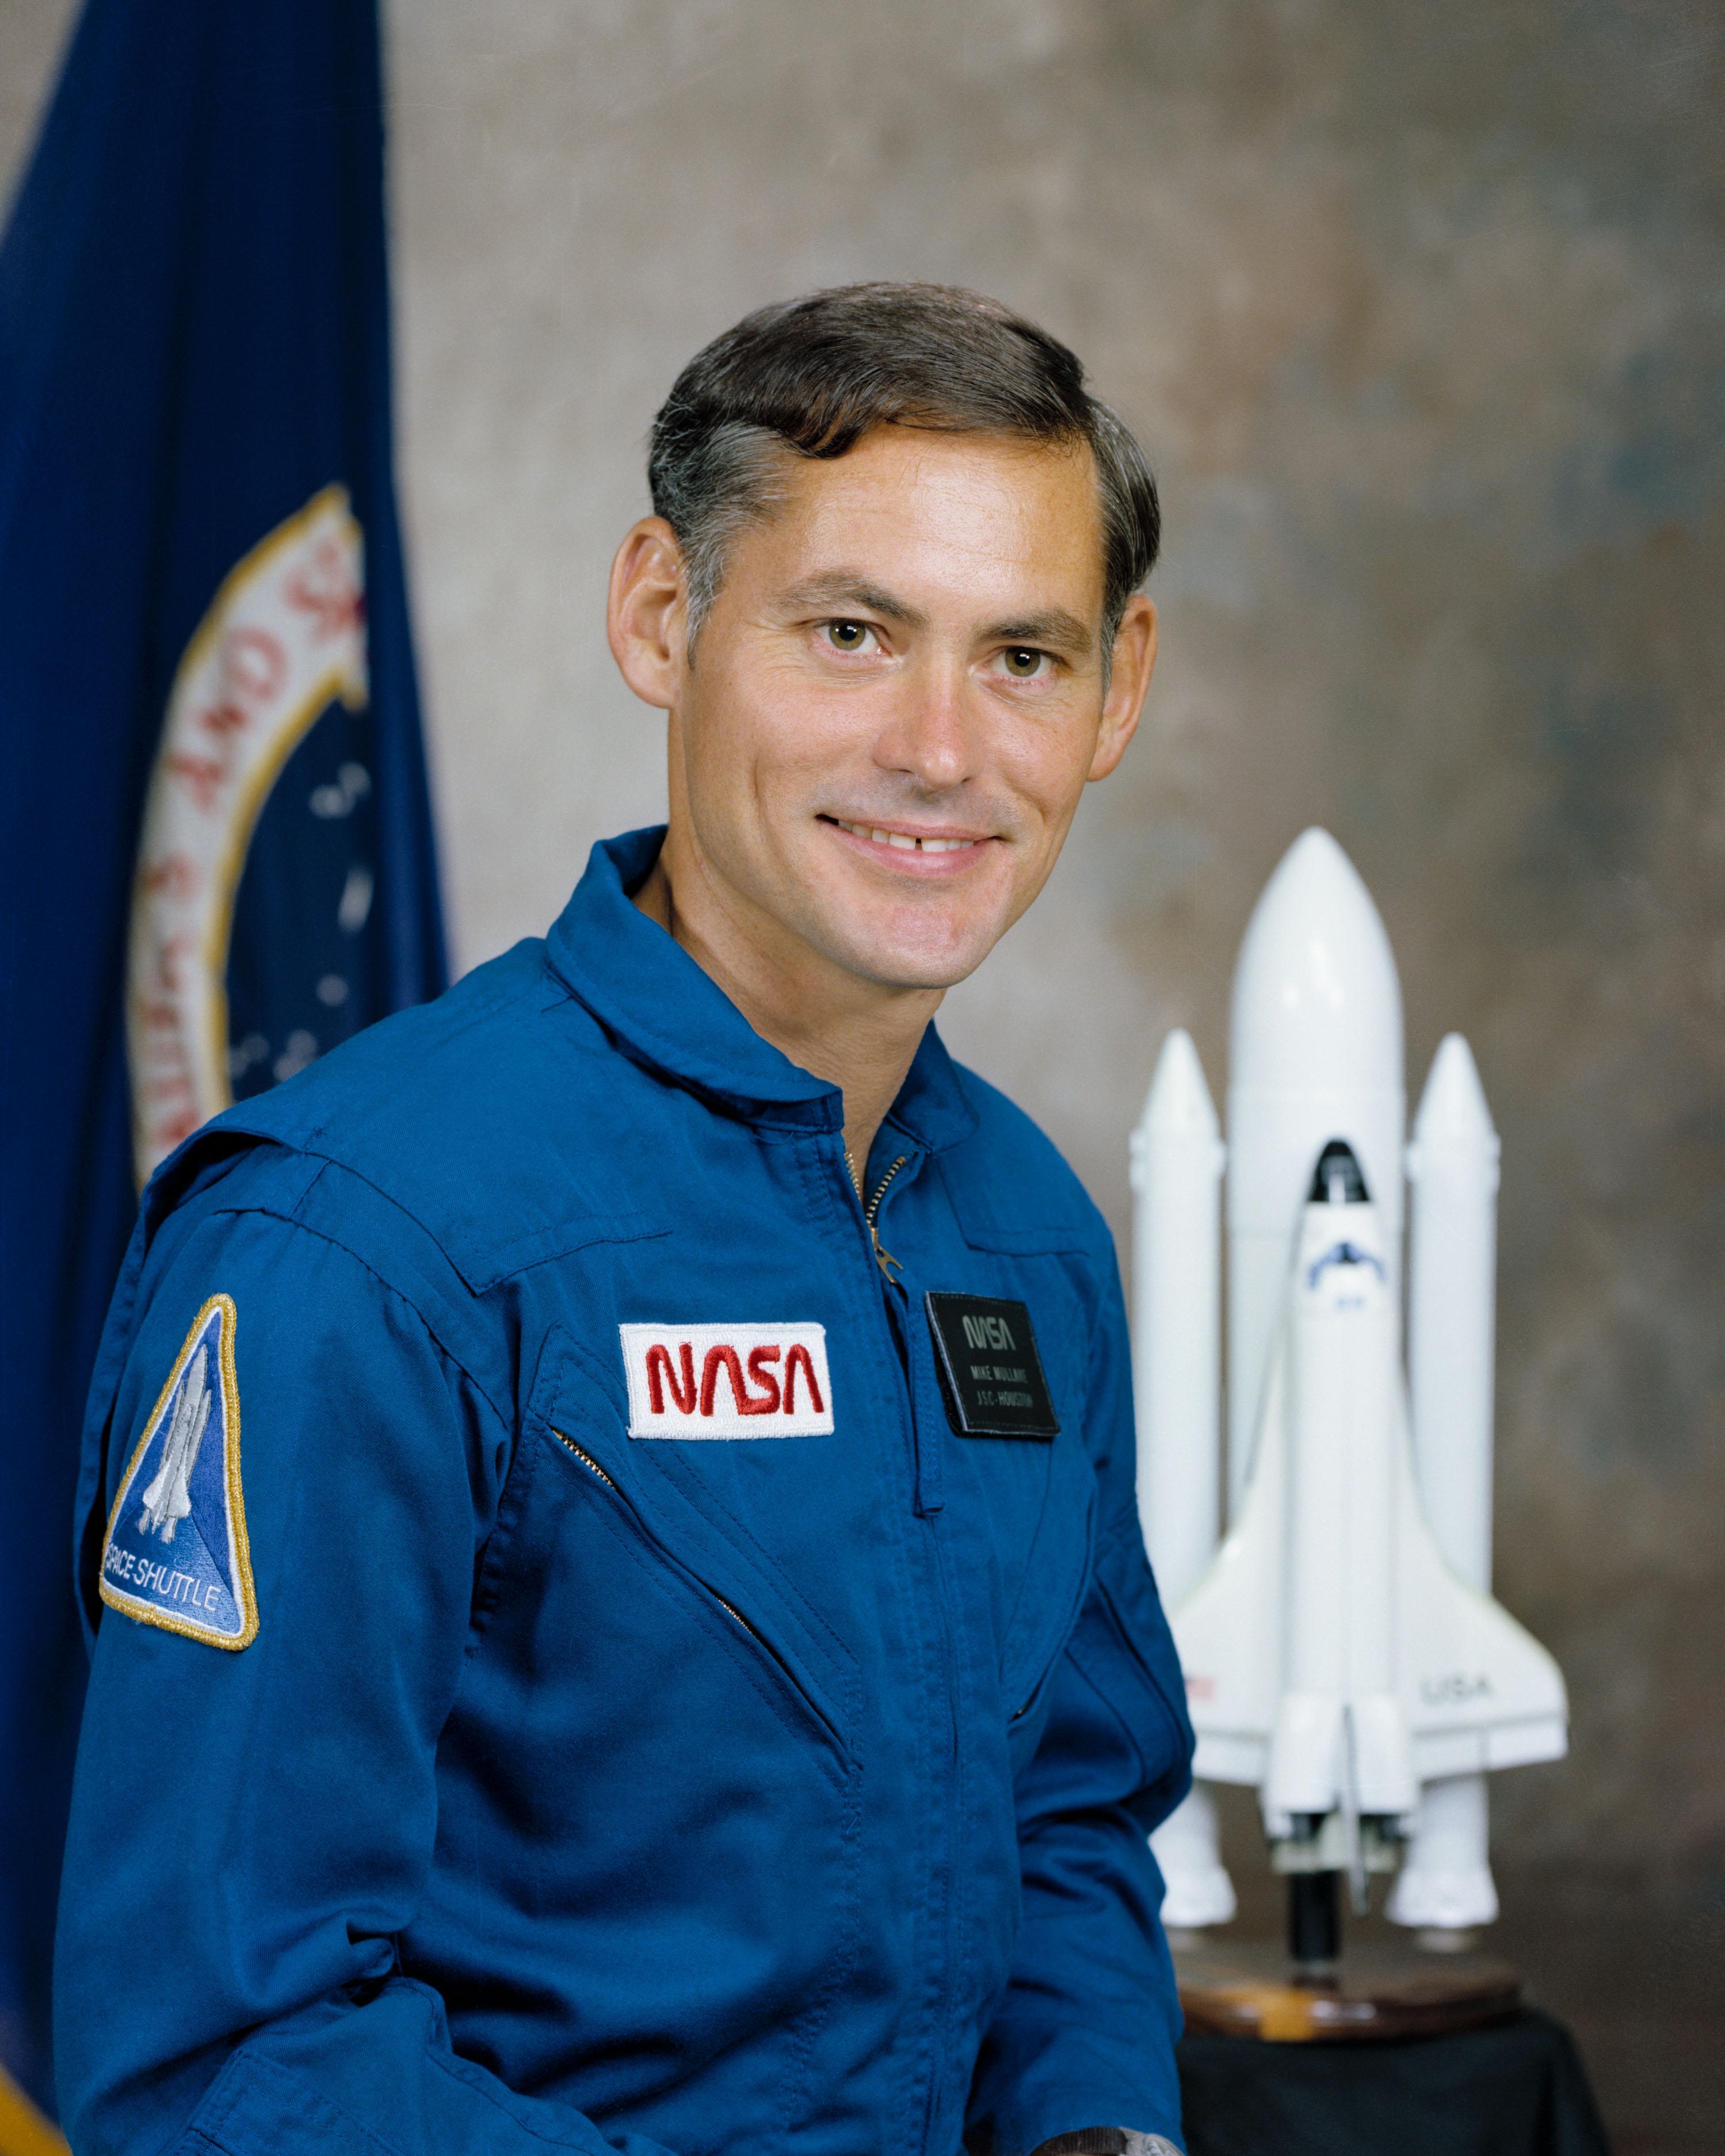 image of Mike Mullane